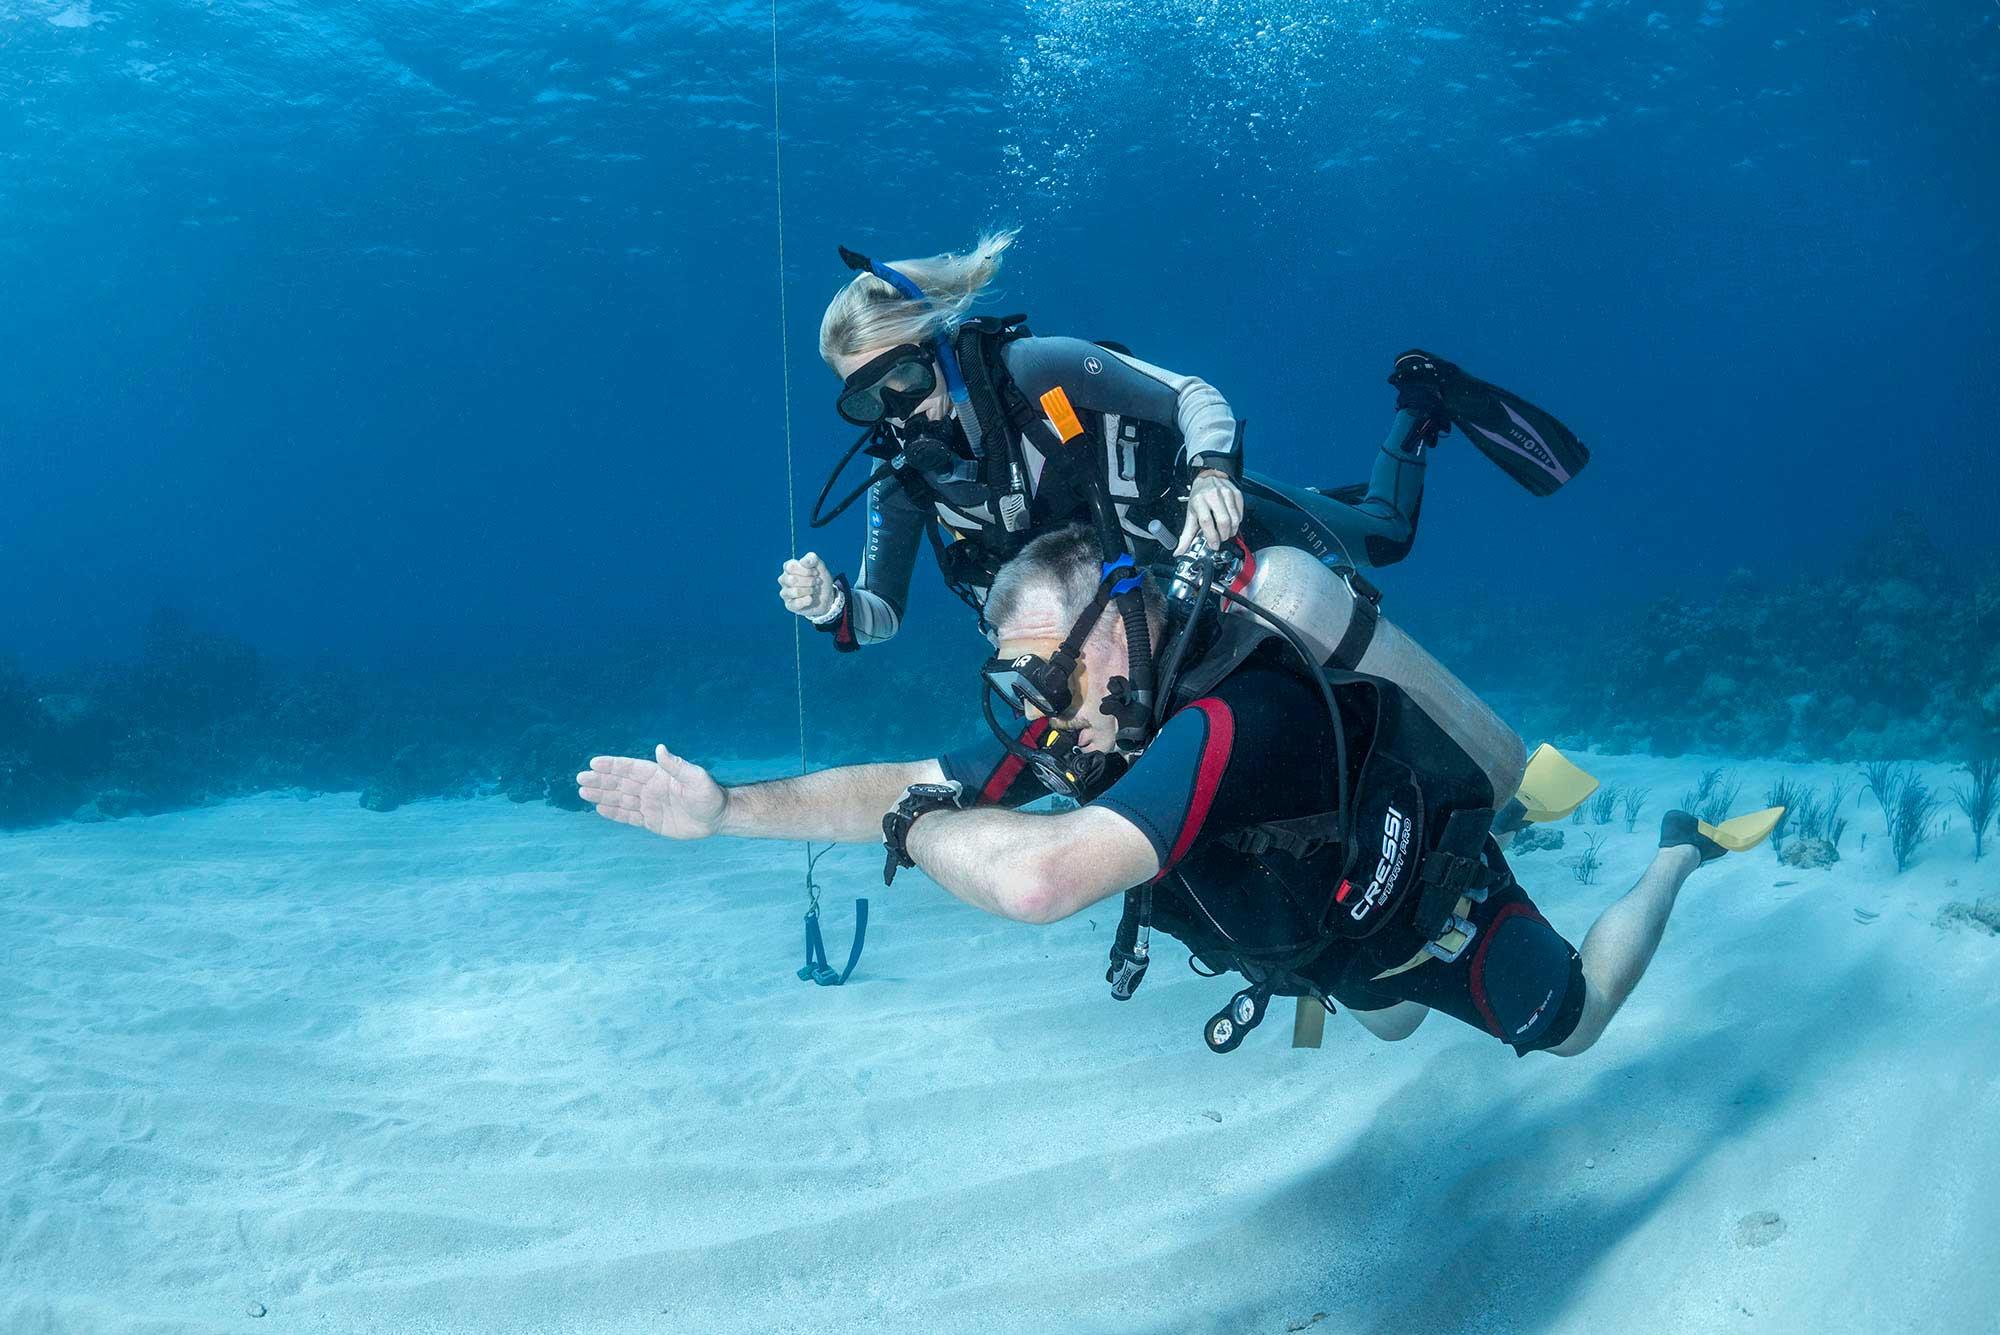 PADI Master Scuba Diver Trainer in action